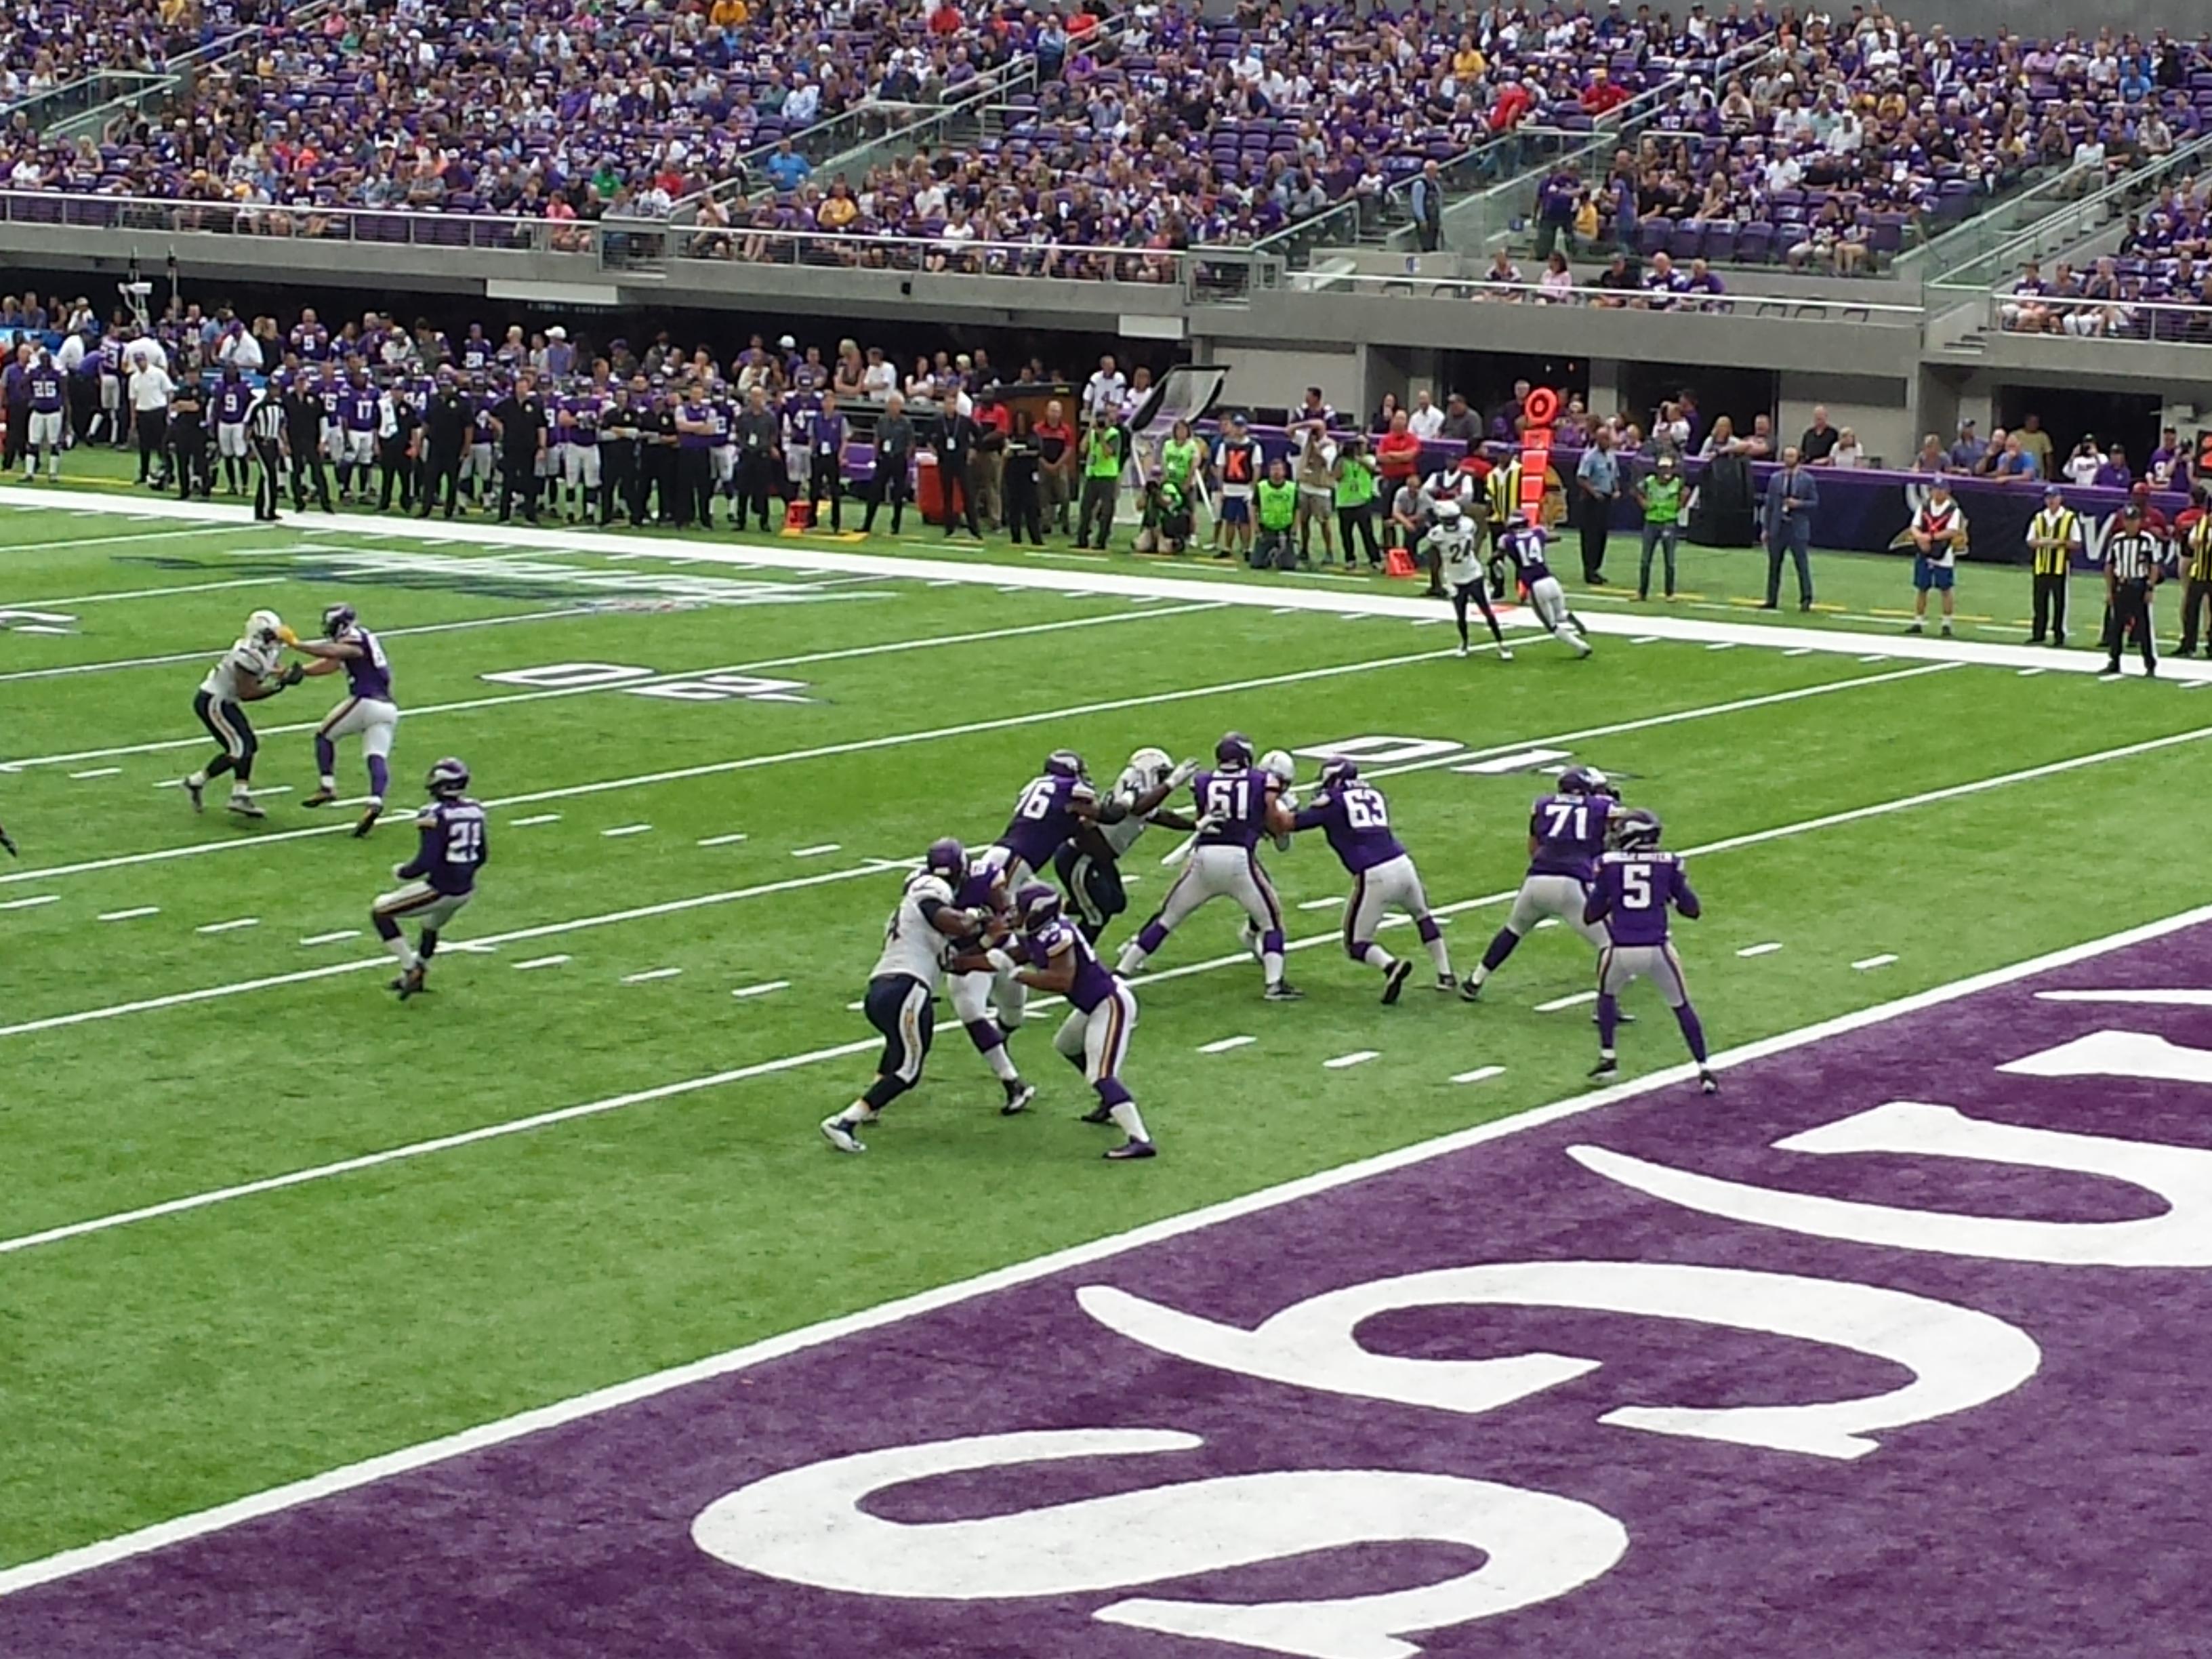 Minnesota Vikings U.S. Bank Stadium First Game - Teddy Bridgewater Drops Back